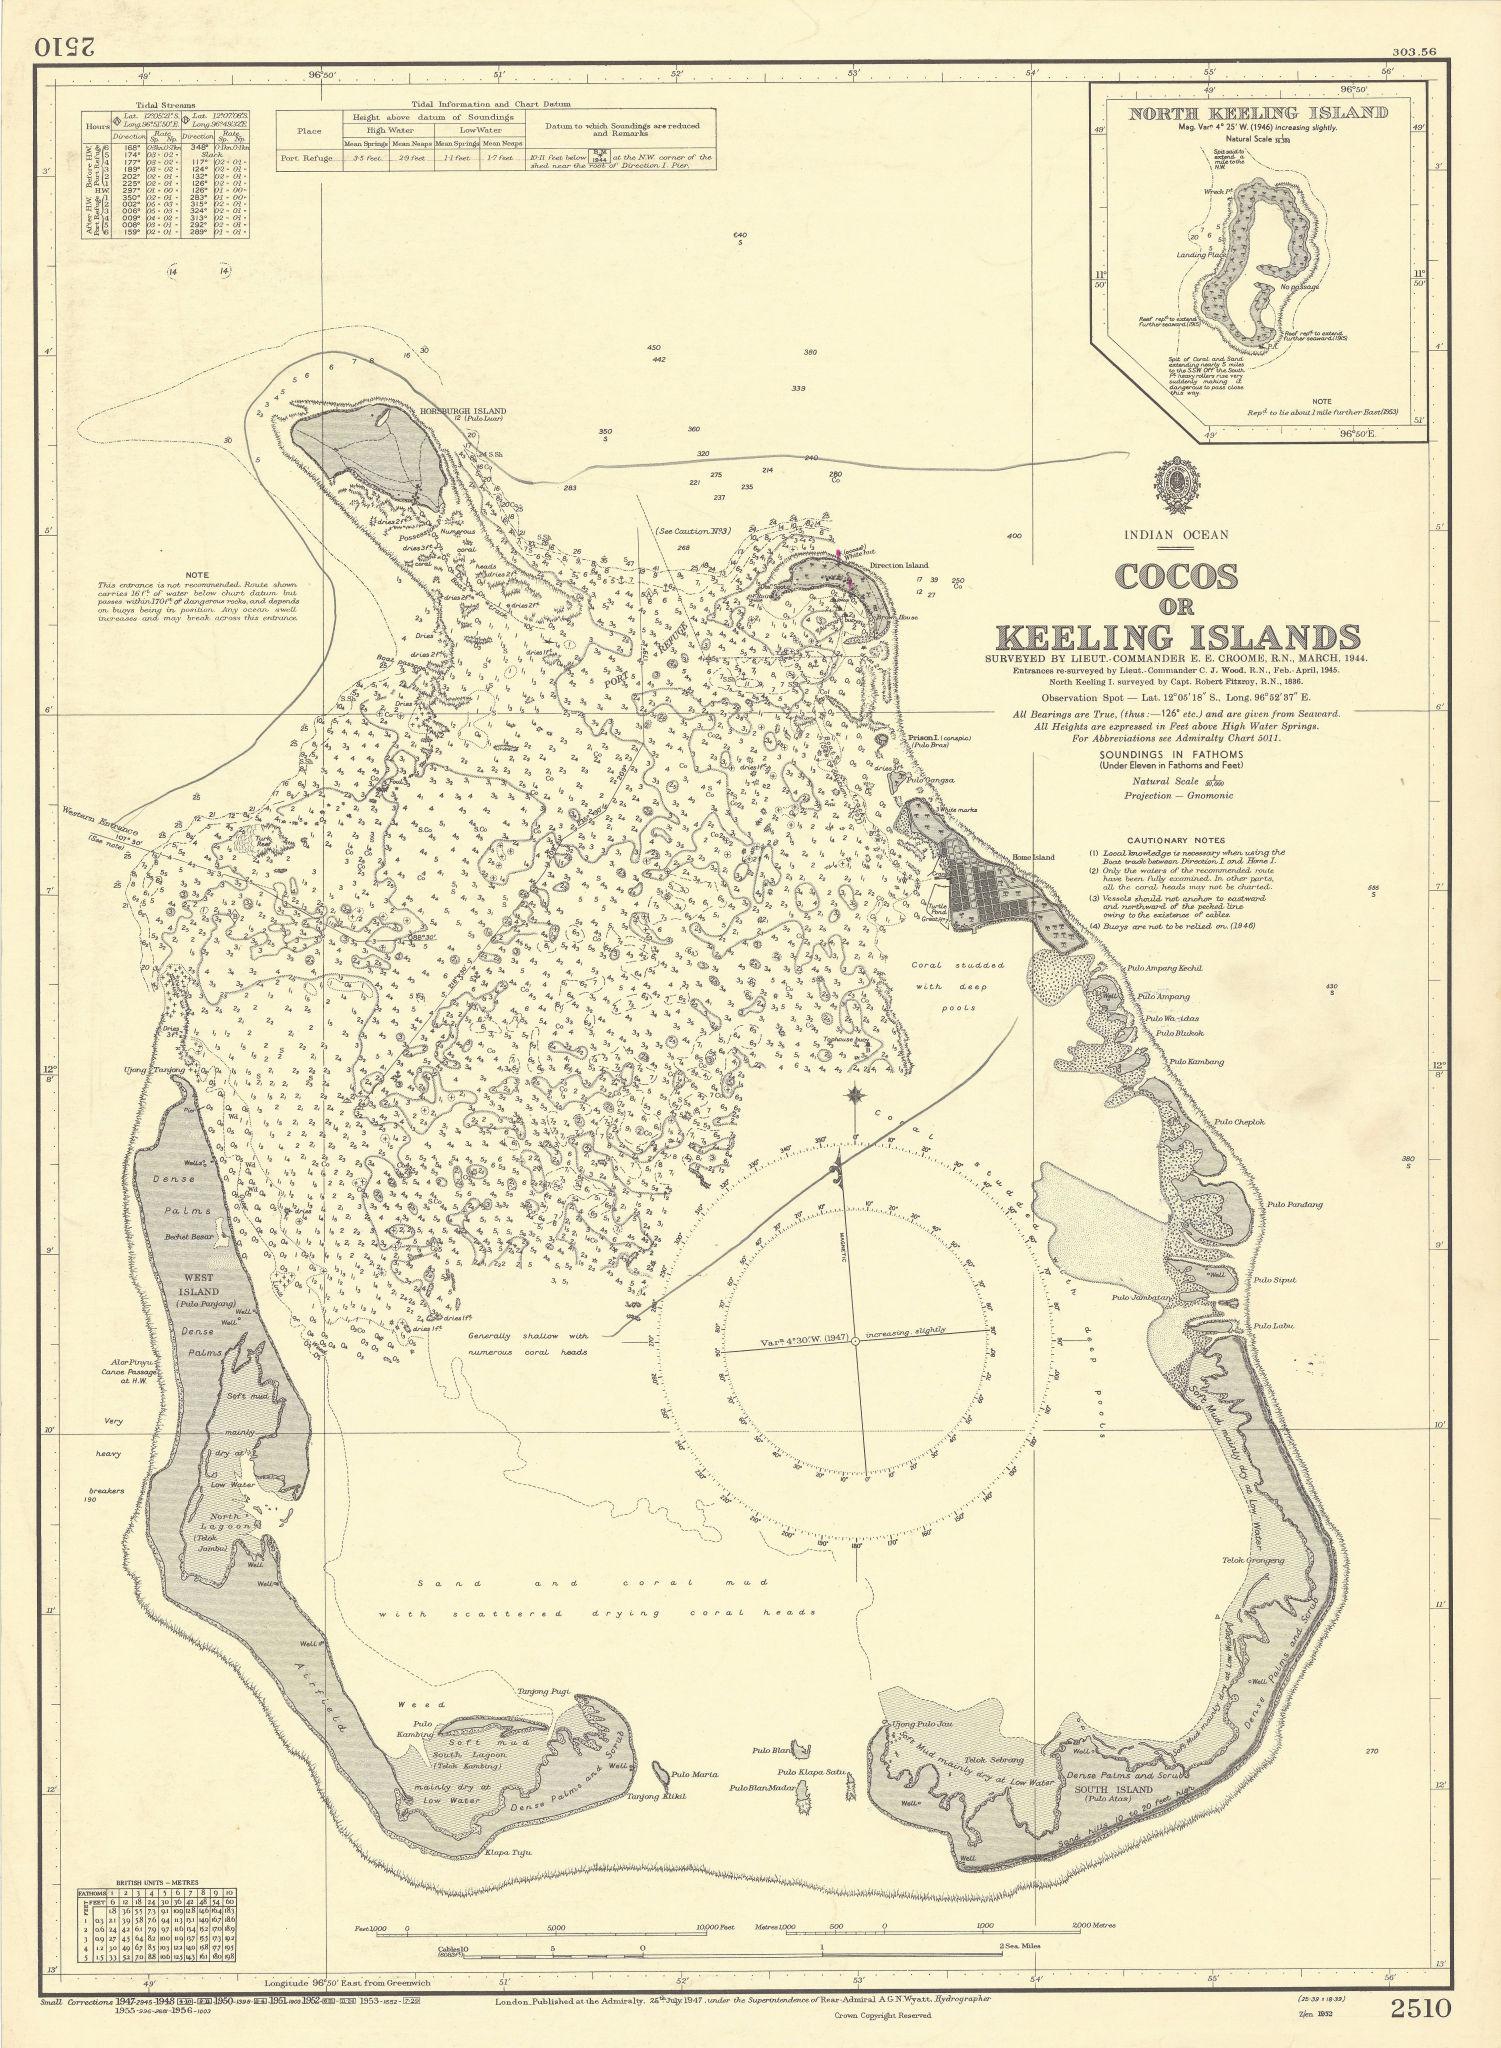 Cocos/Keeling Islands Indian Ocean Australia ADMIRALTY sea chart 1947 (1956) map